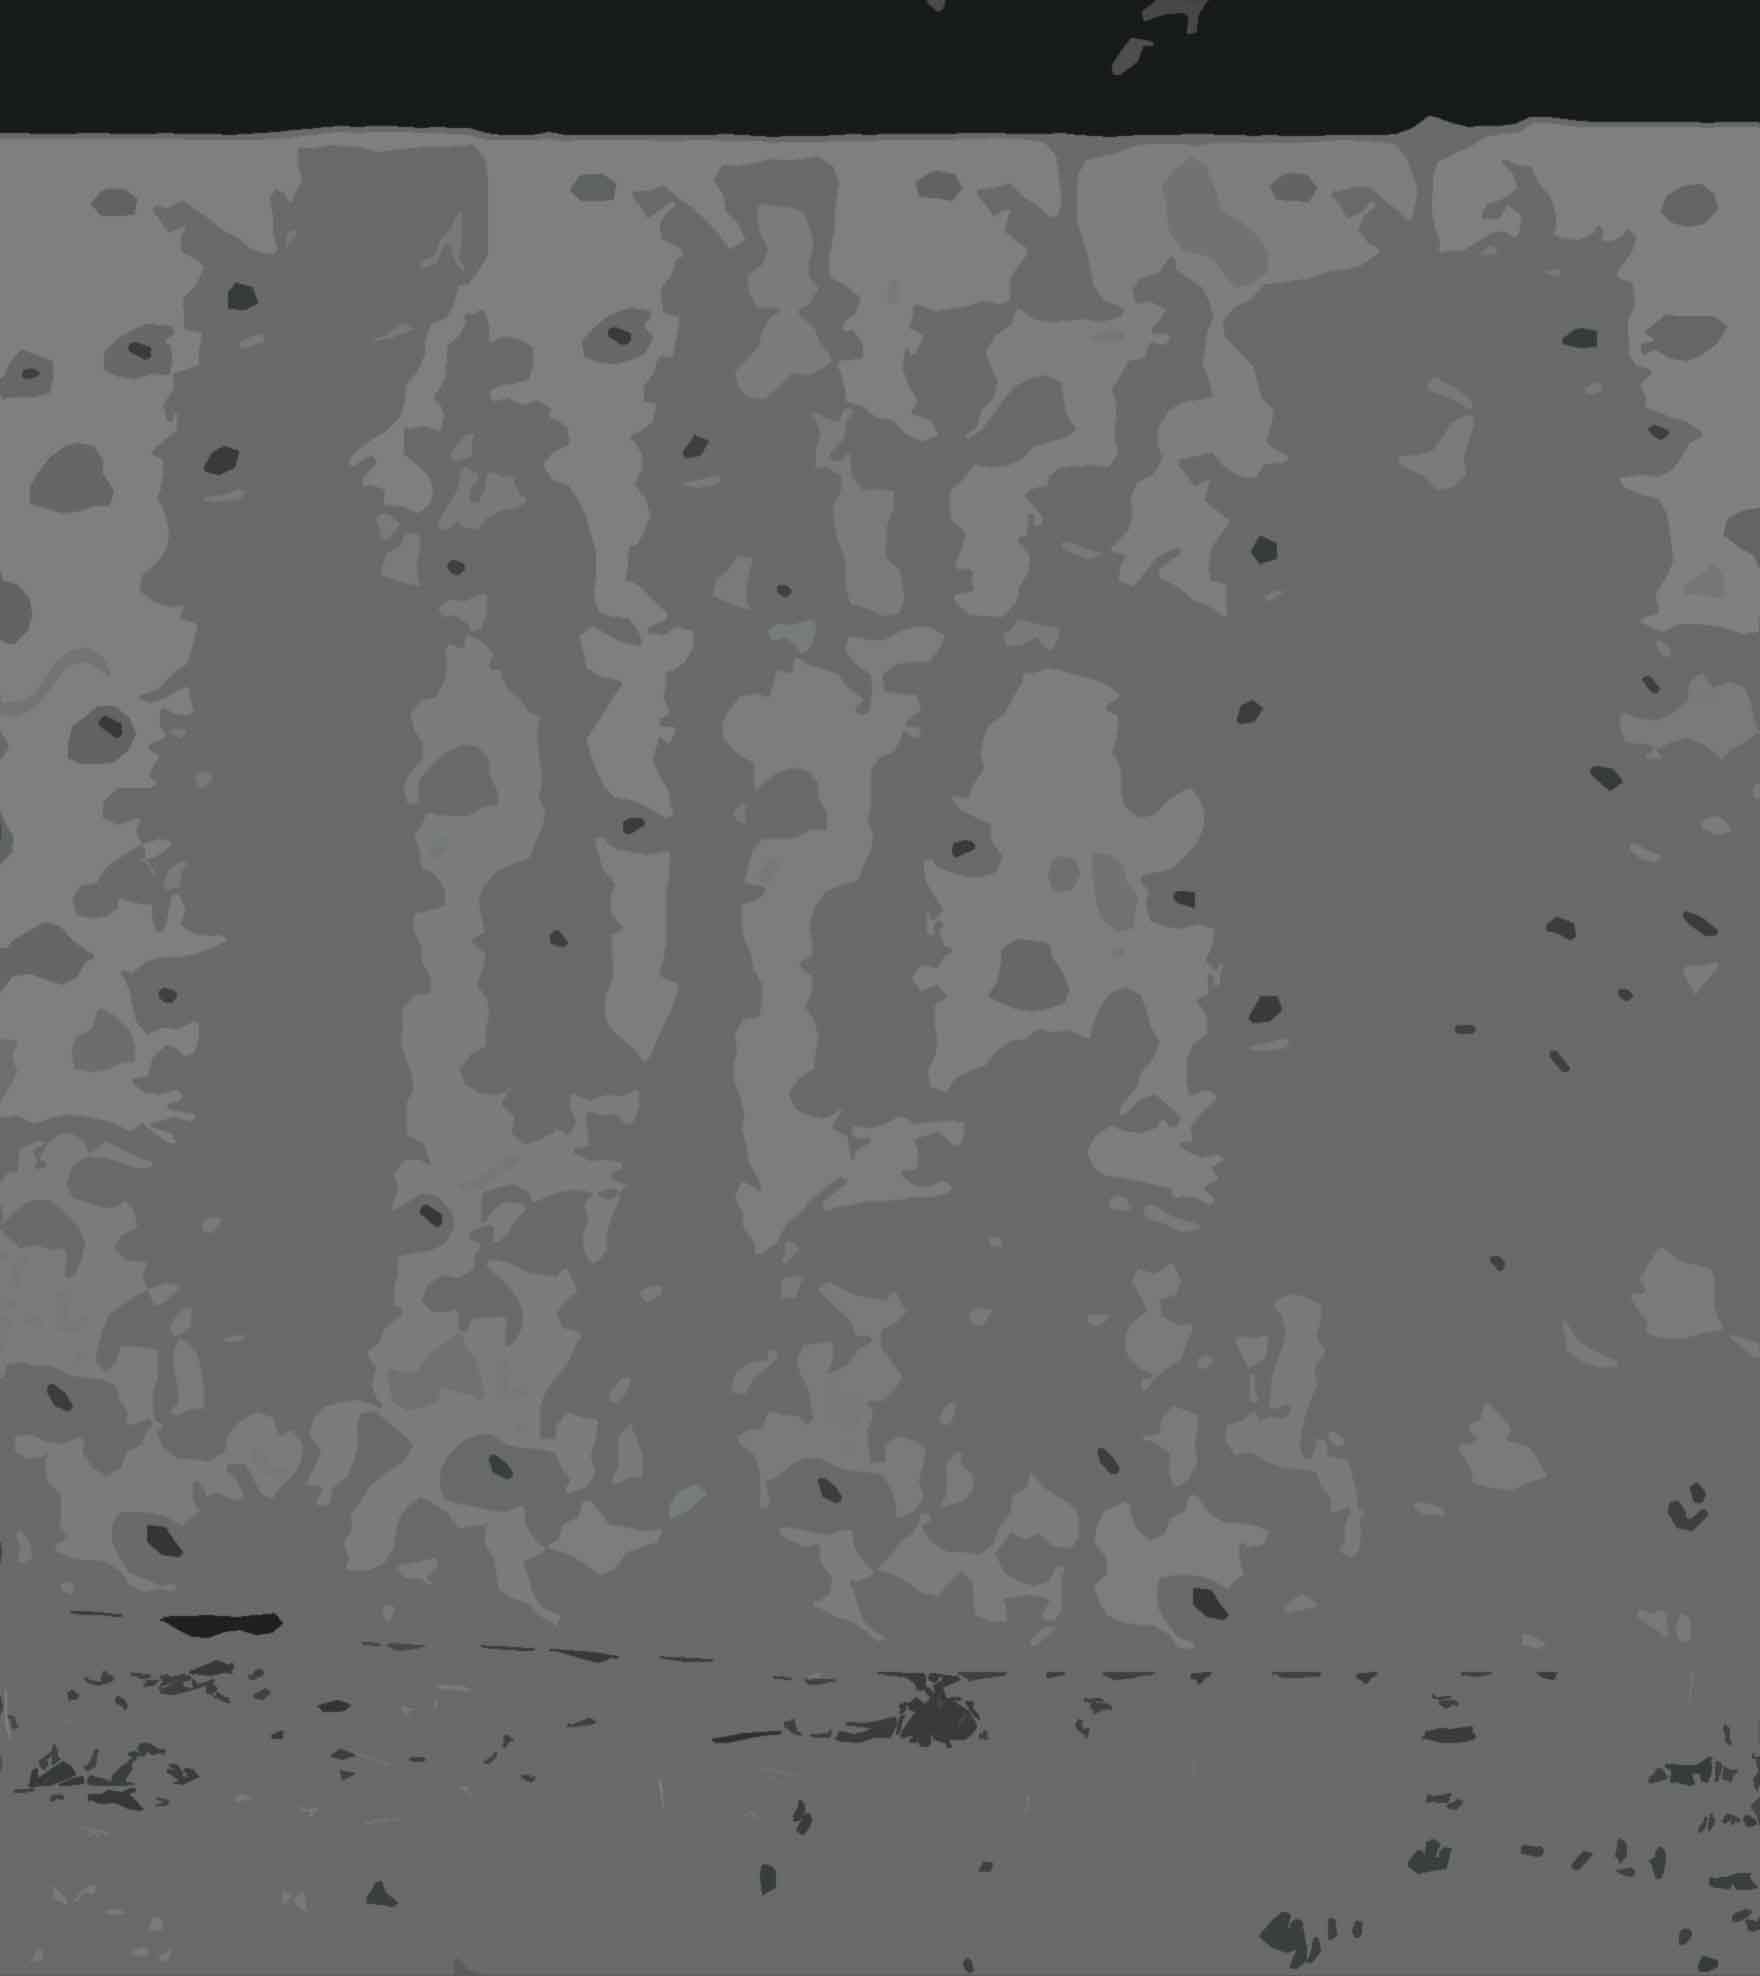 5dba59f9ece4c33993200258 blank blank blank blank blank blank blank